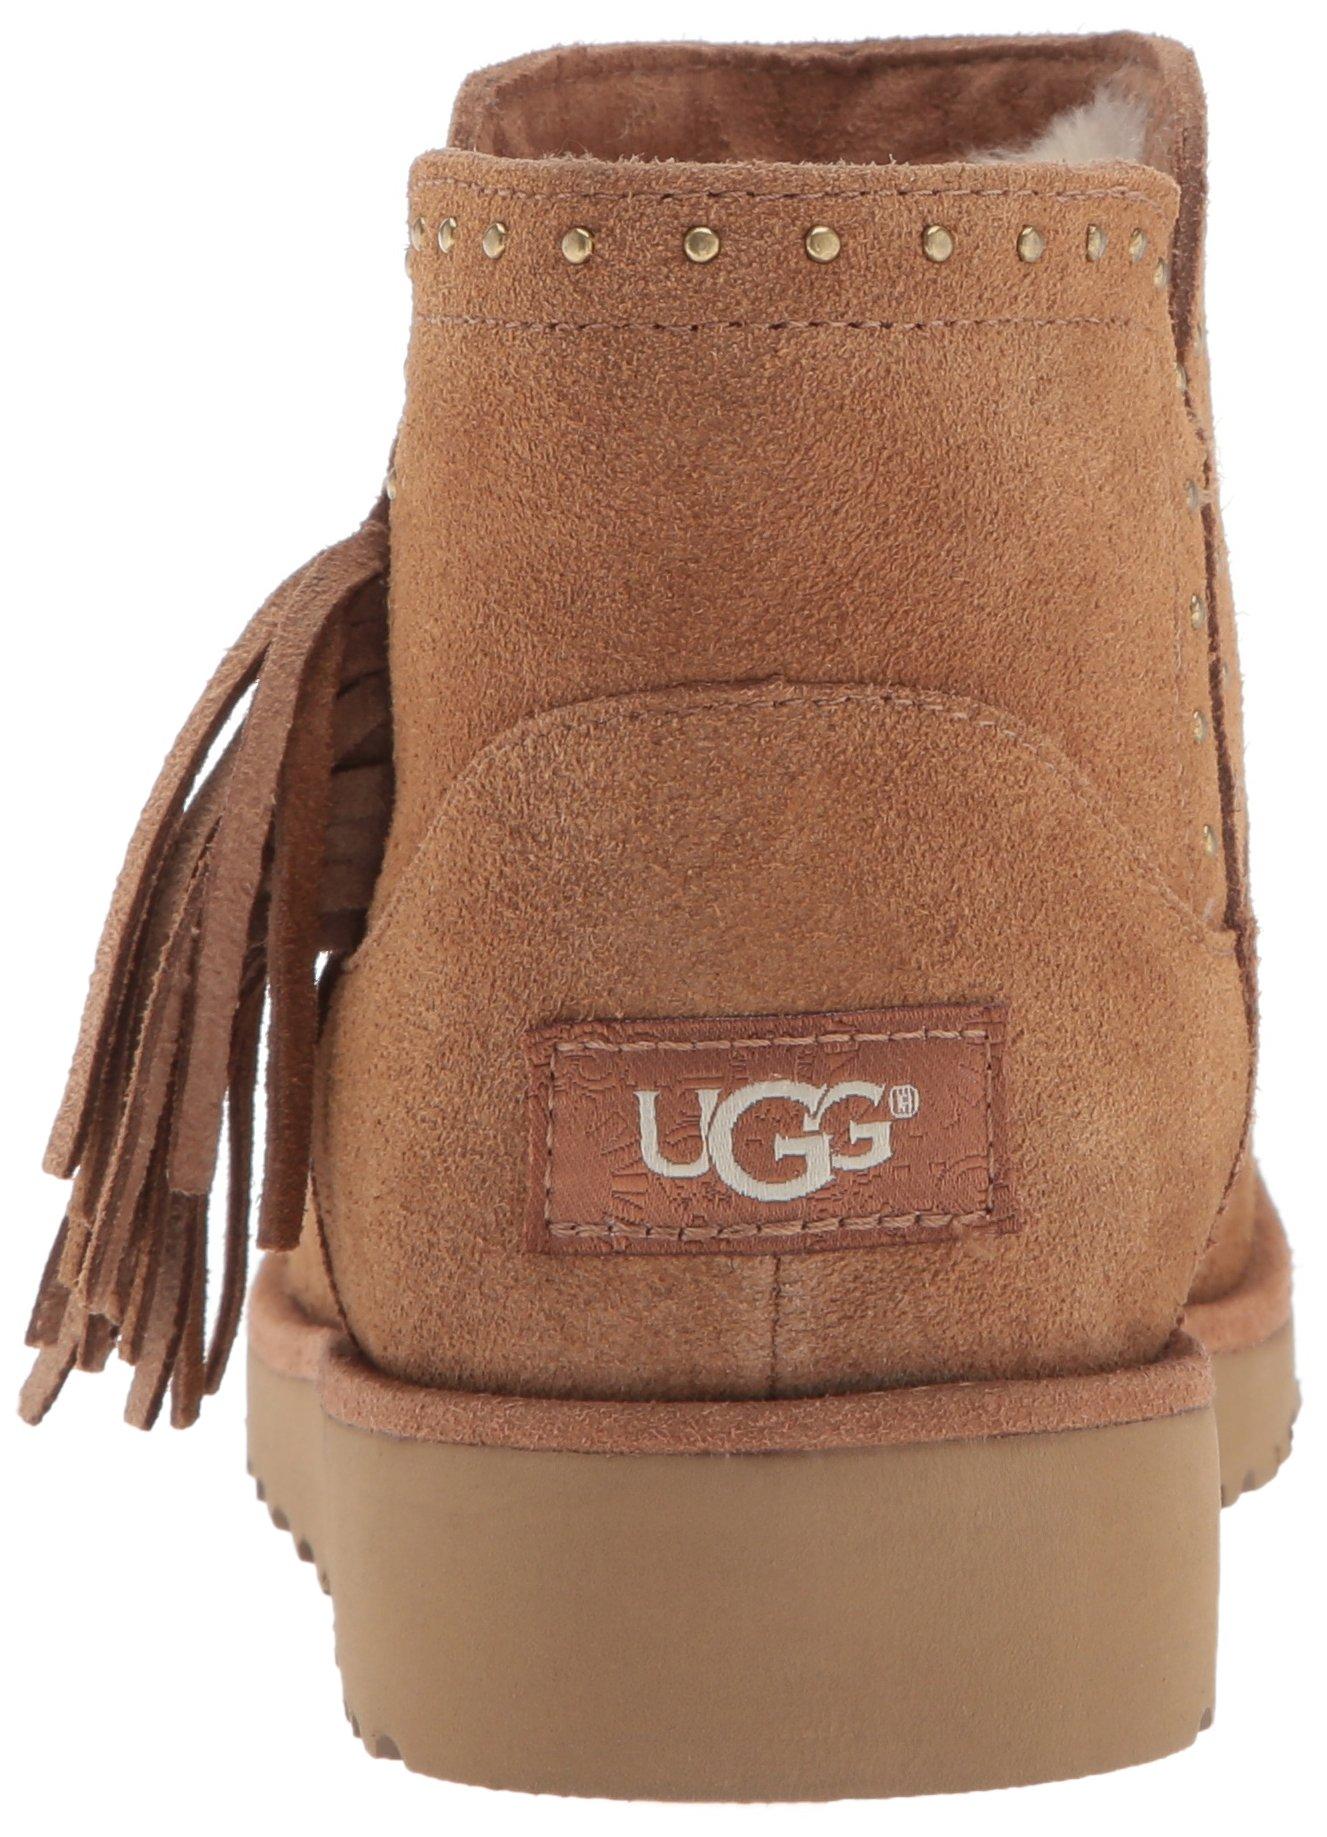 UGG Girls K Cindy Bootie, Chestnut, 3 M US Little Kid by UGG (Image #2)